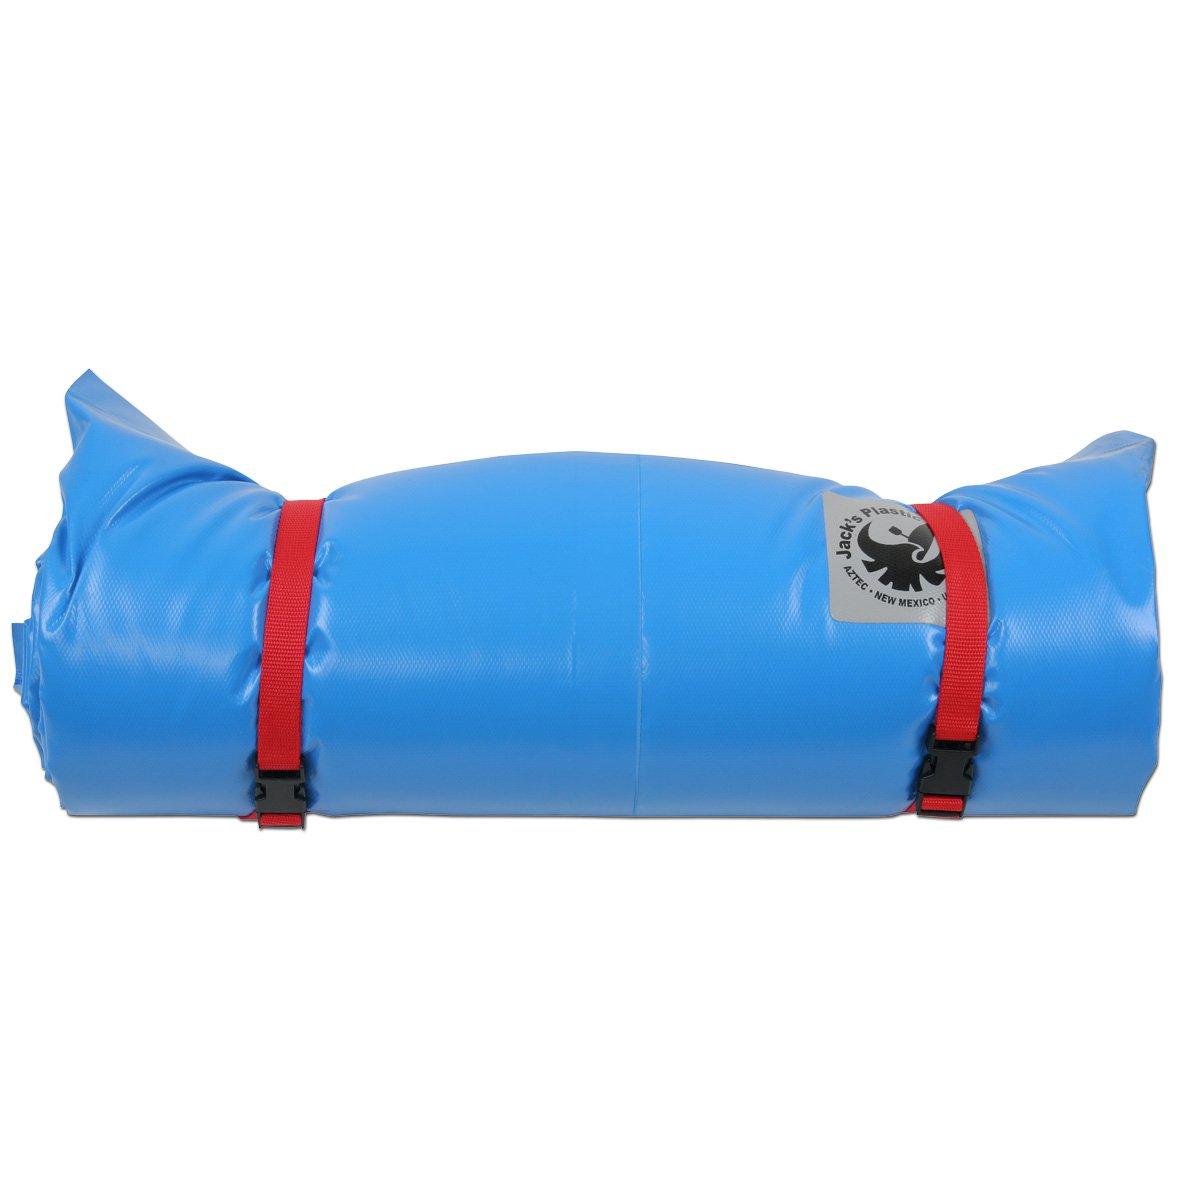 JACK'S PLASTIC Super Paco Sleeping Pad Light Blue One Size